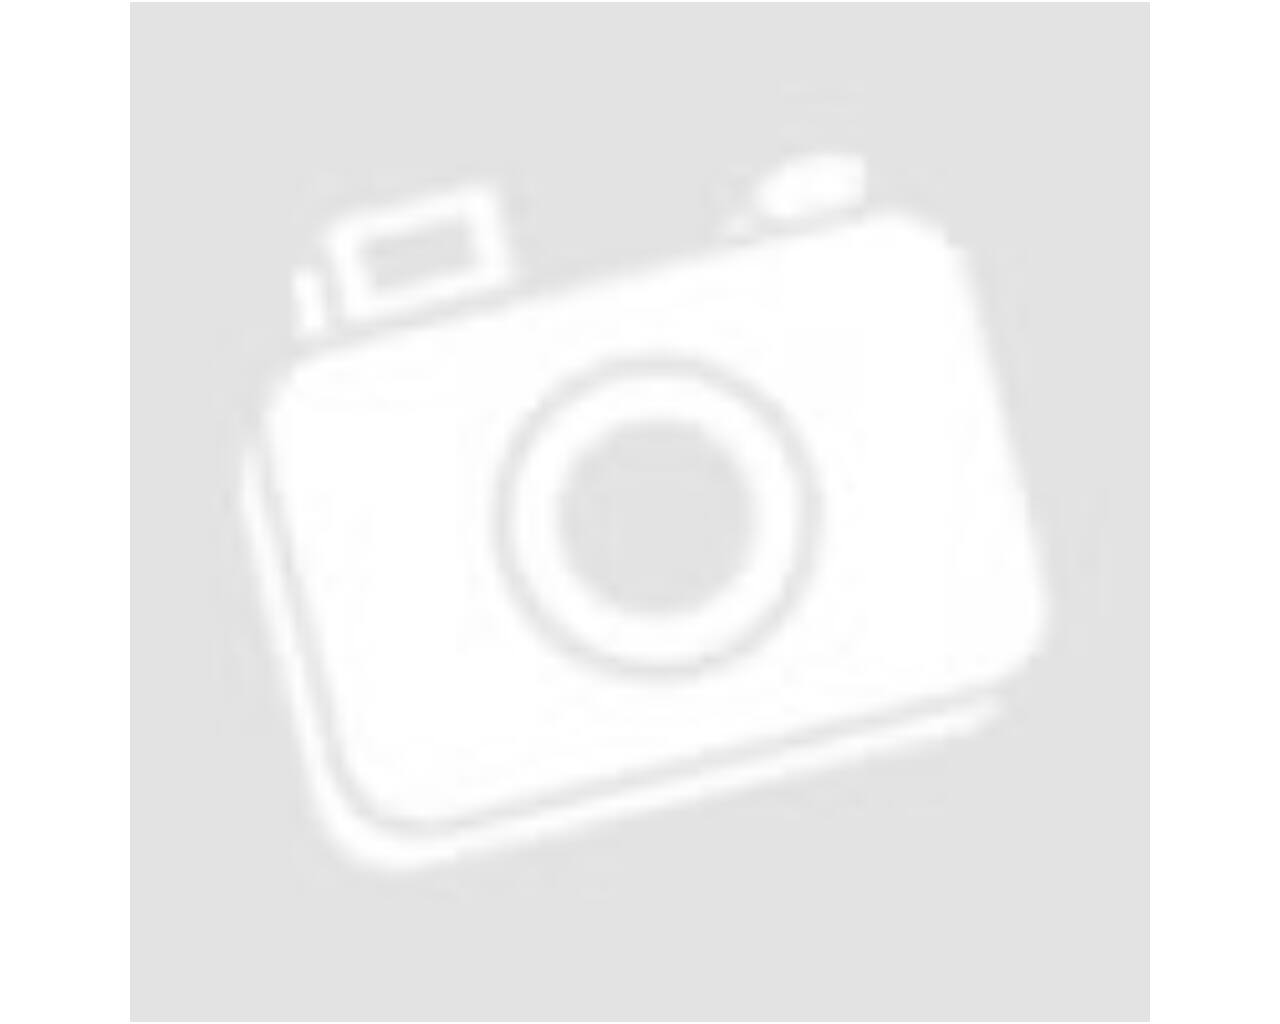 vörösbarna sötétítő függöny, 100% poliészter, 135 cm x 245 cm